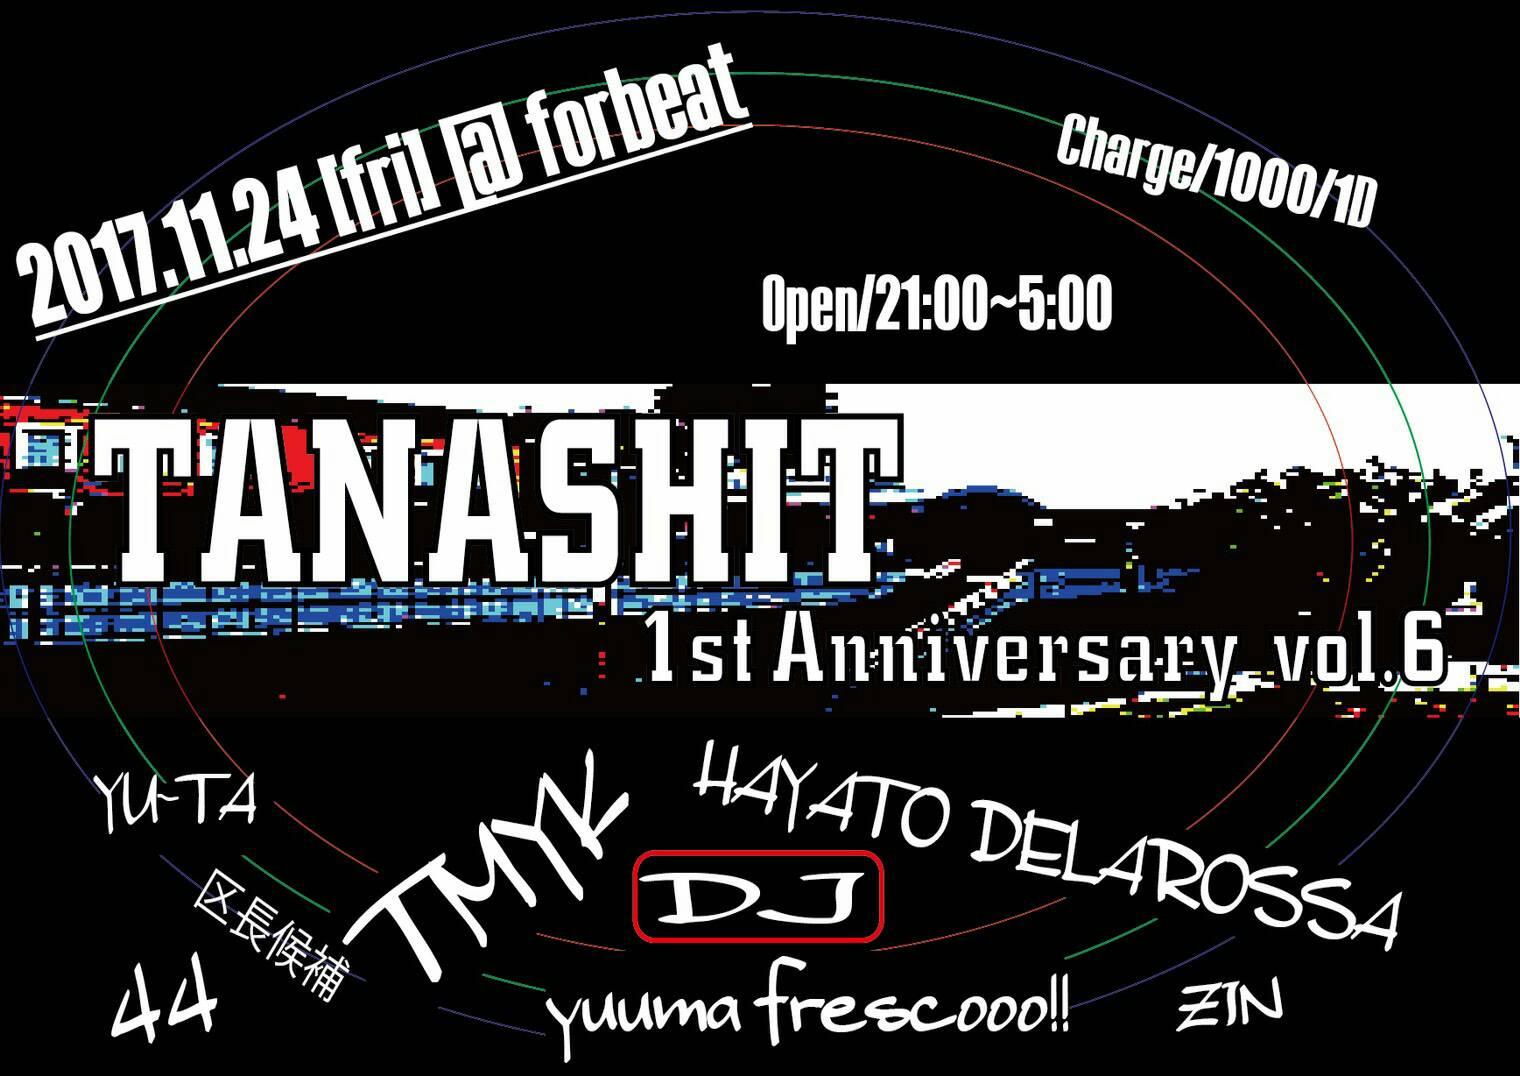 11/24(fri) 「TANASHIT -1st anv-」vol.6@forbeat